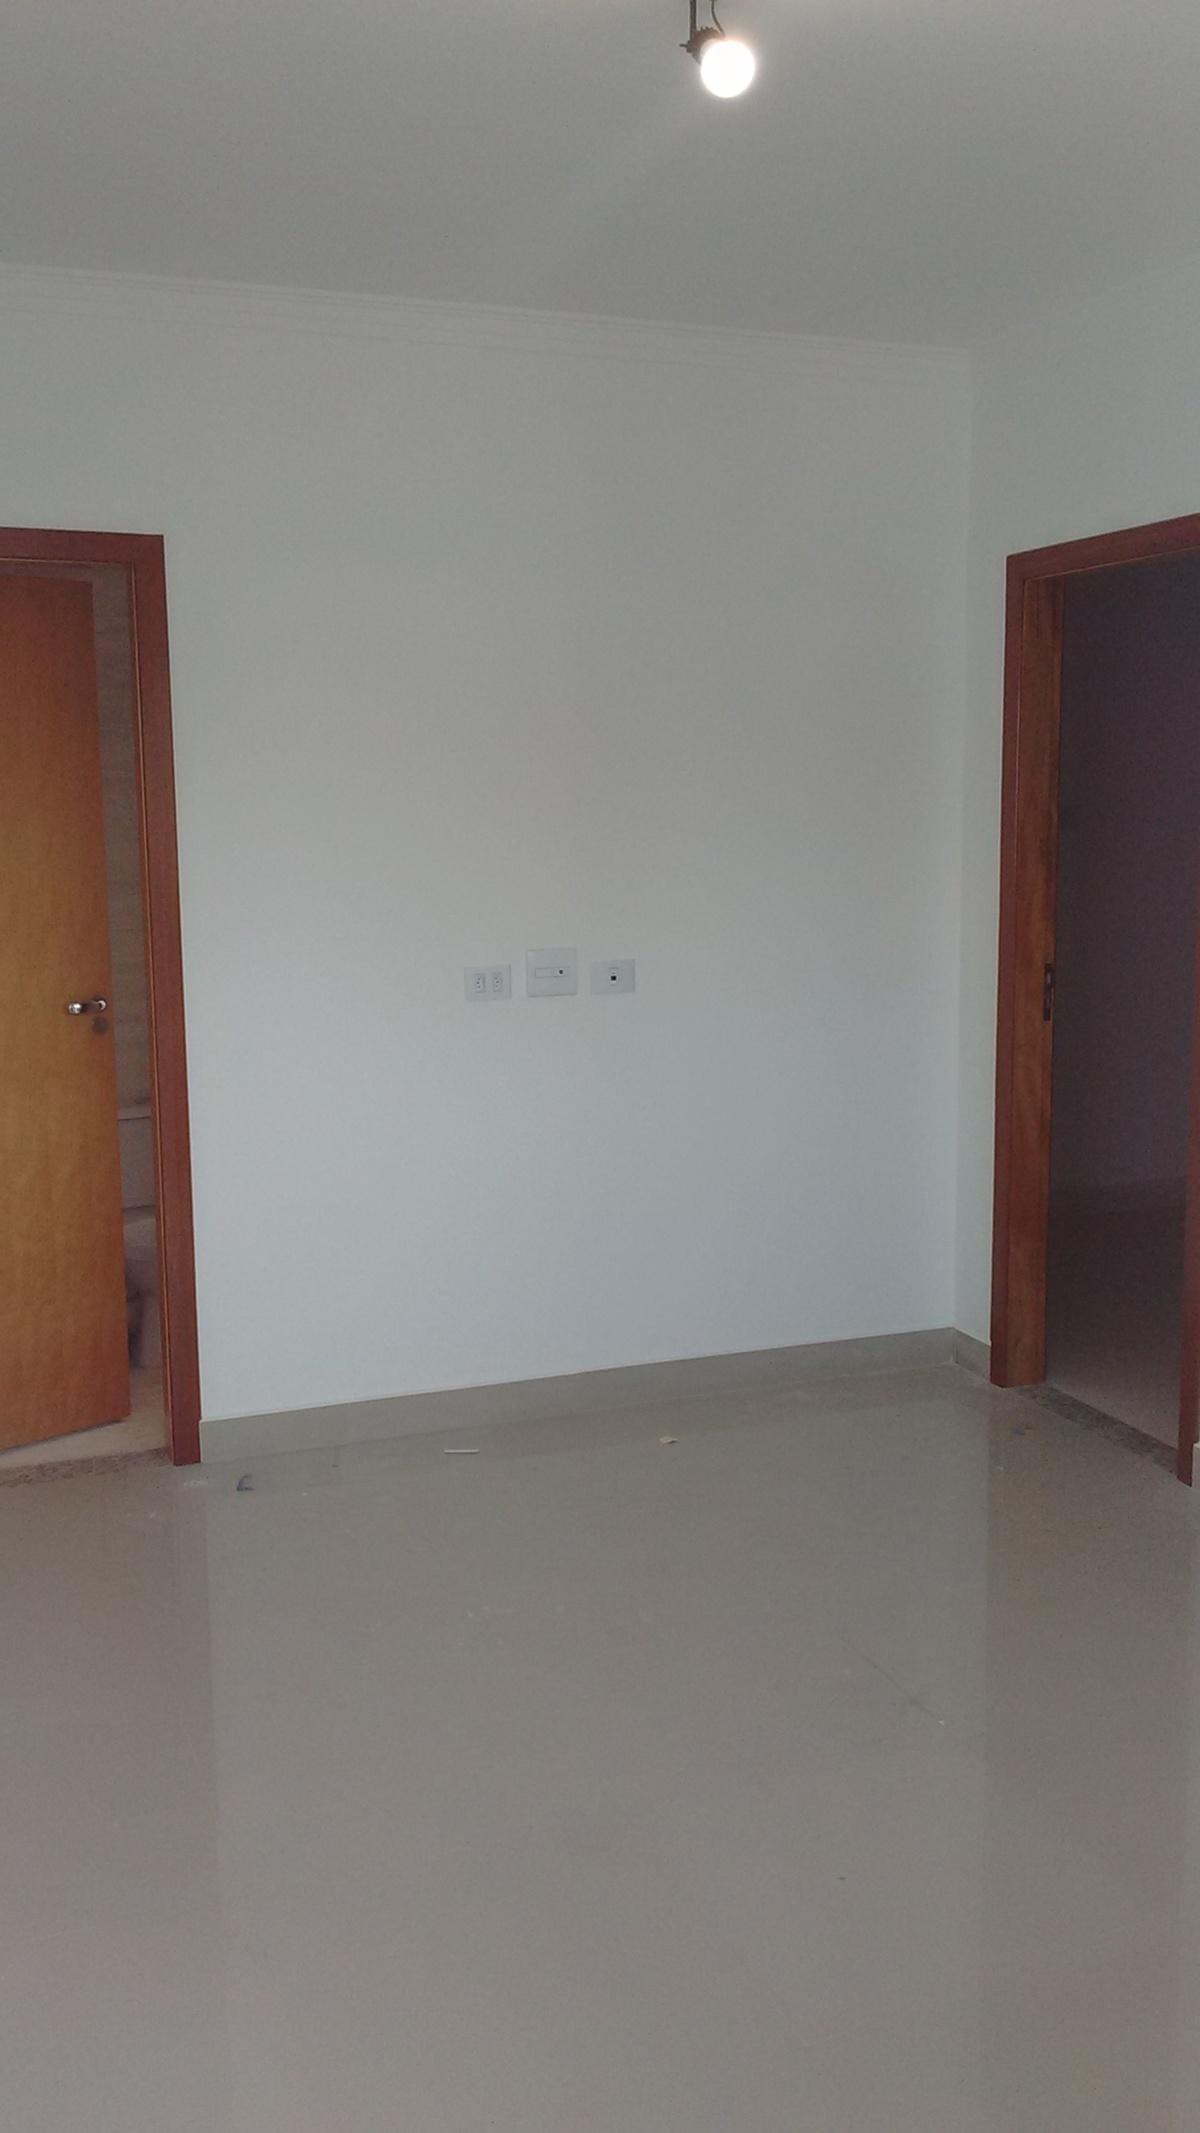 9 de 21: Banheiro a Esquerda e Dormitorio Direita